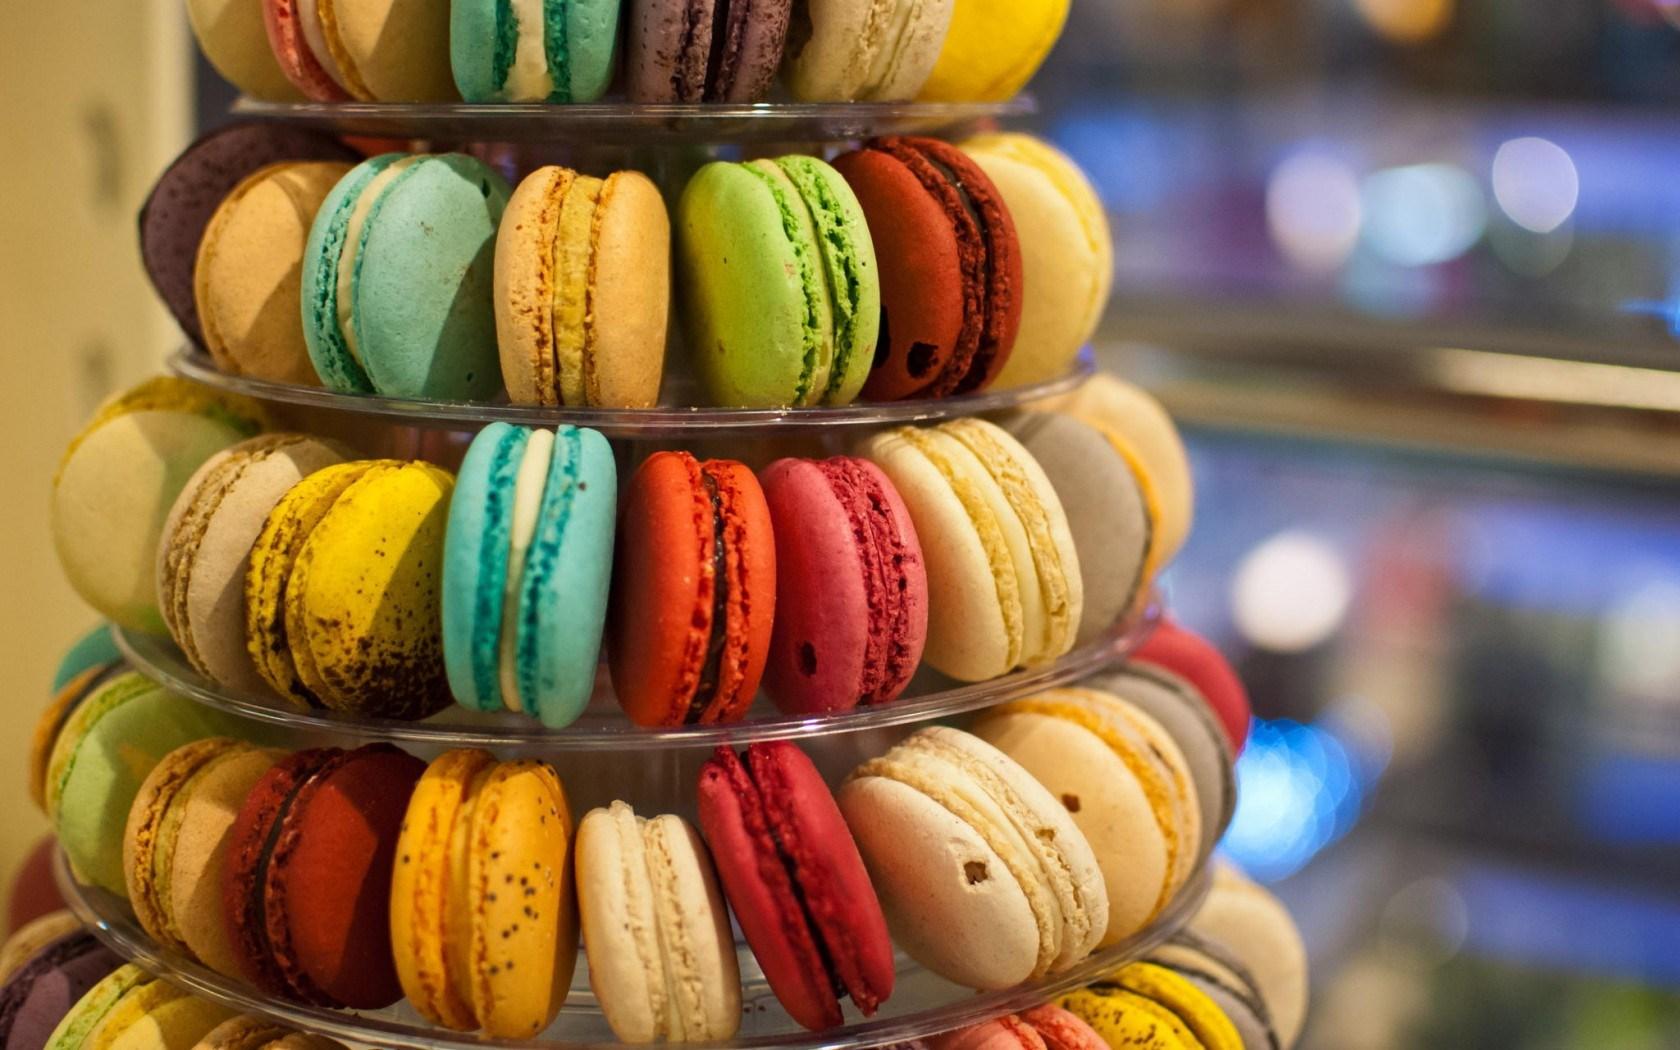 Cookies Macaron Macaroon Colorful Assorted